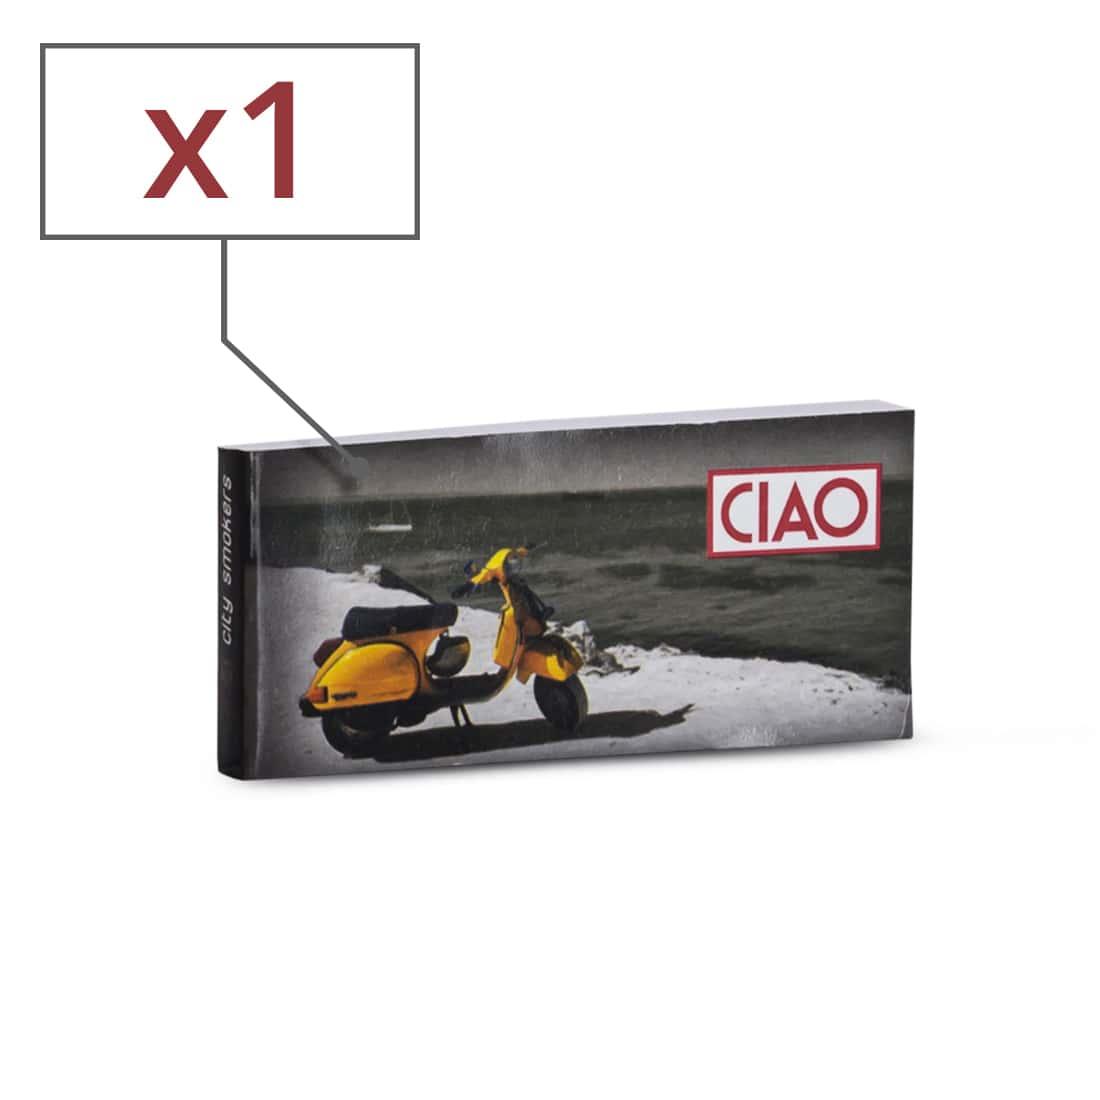 Photo de Filtre carton Ciao x 1 large